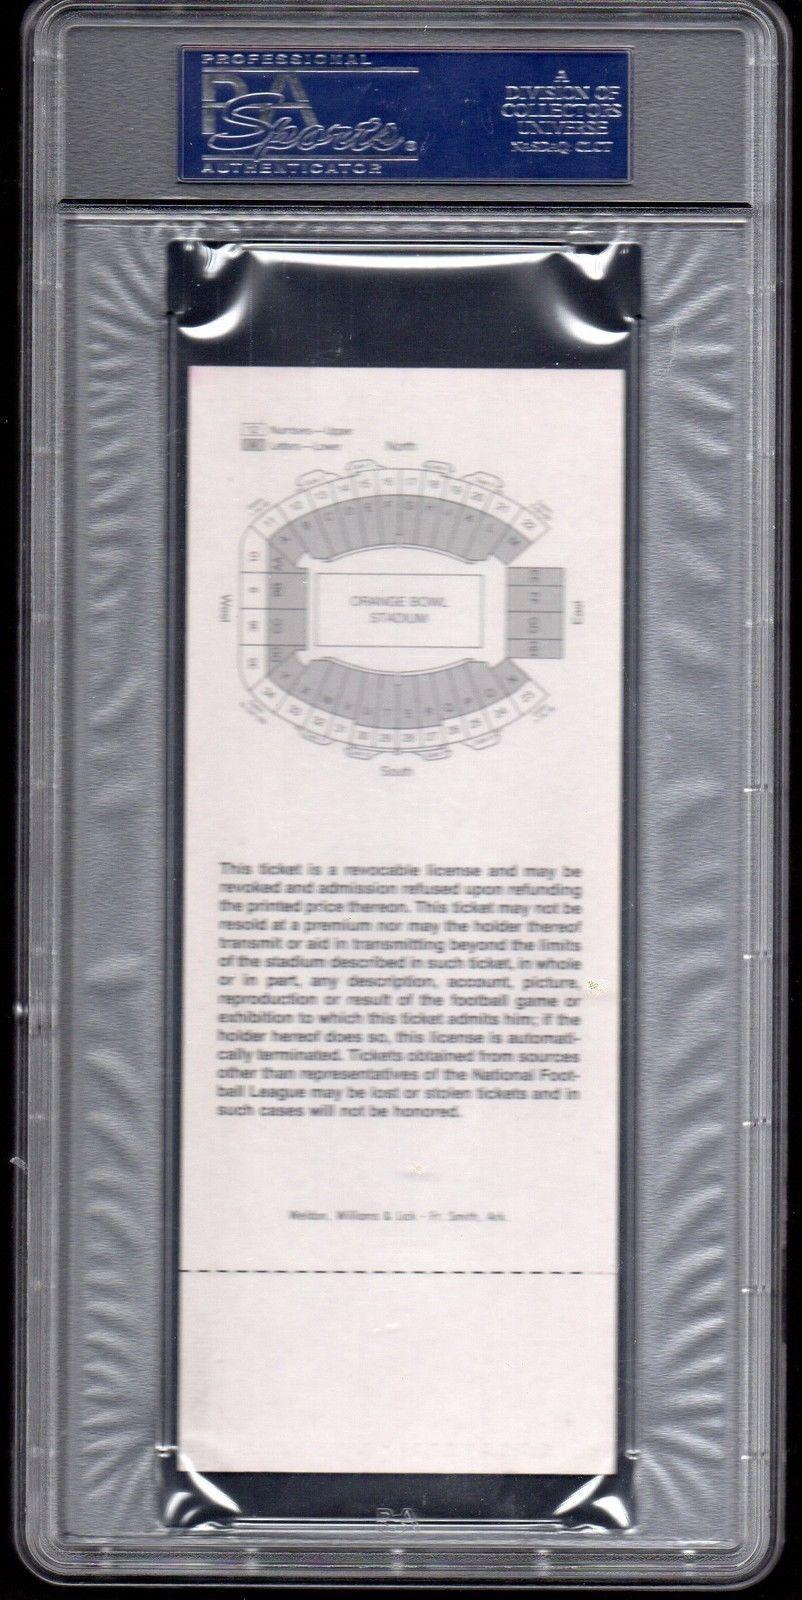 SUPER BOWL XIII Full Ticket PSA 6- January 21,1979 - Steelers vs. Cowboys